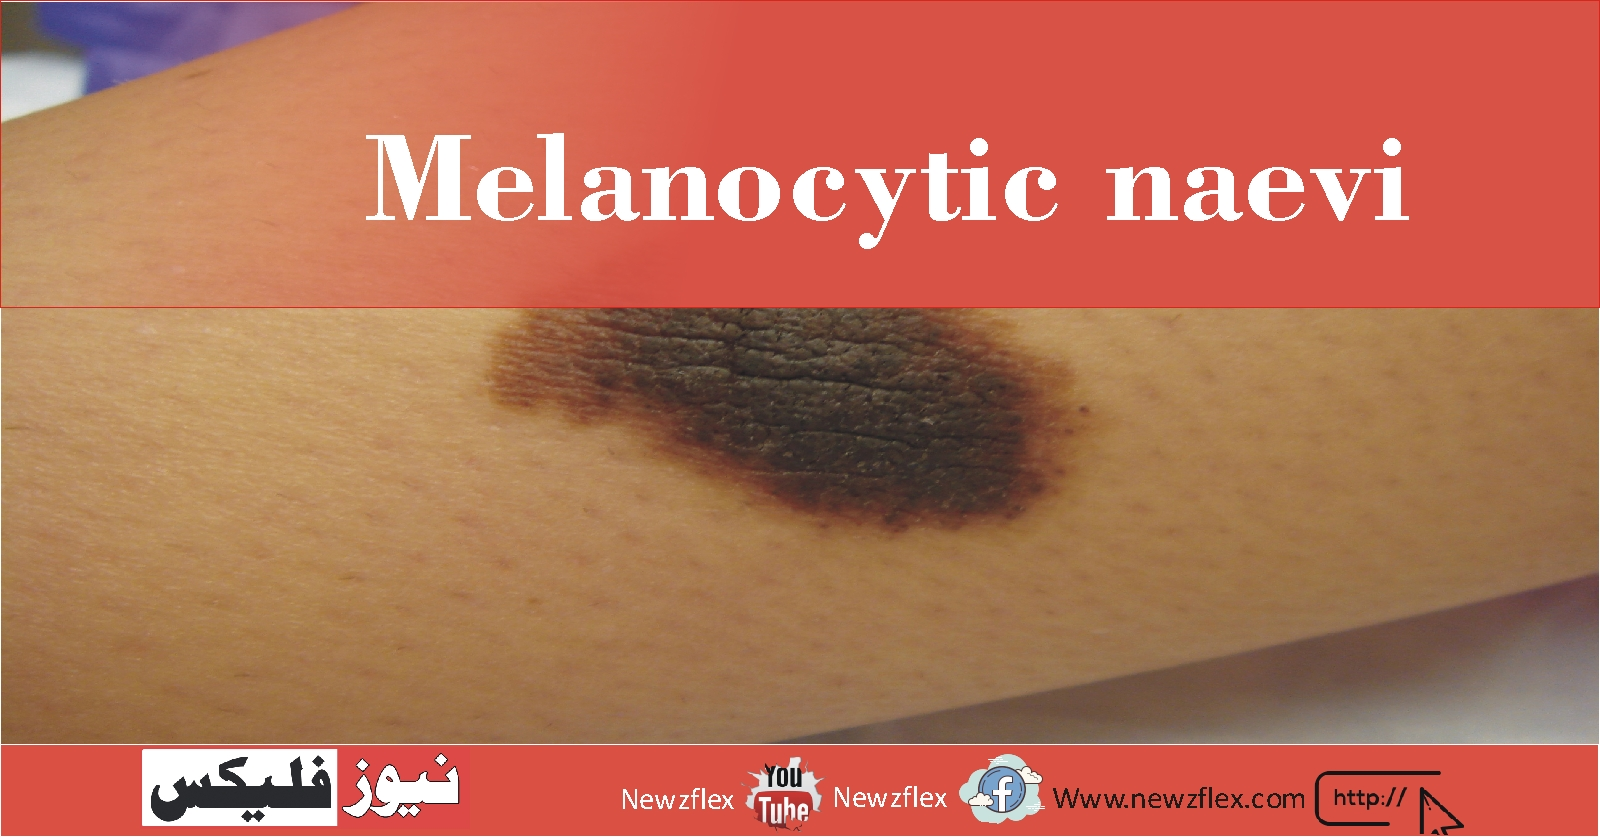 Melanocytic naevi